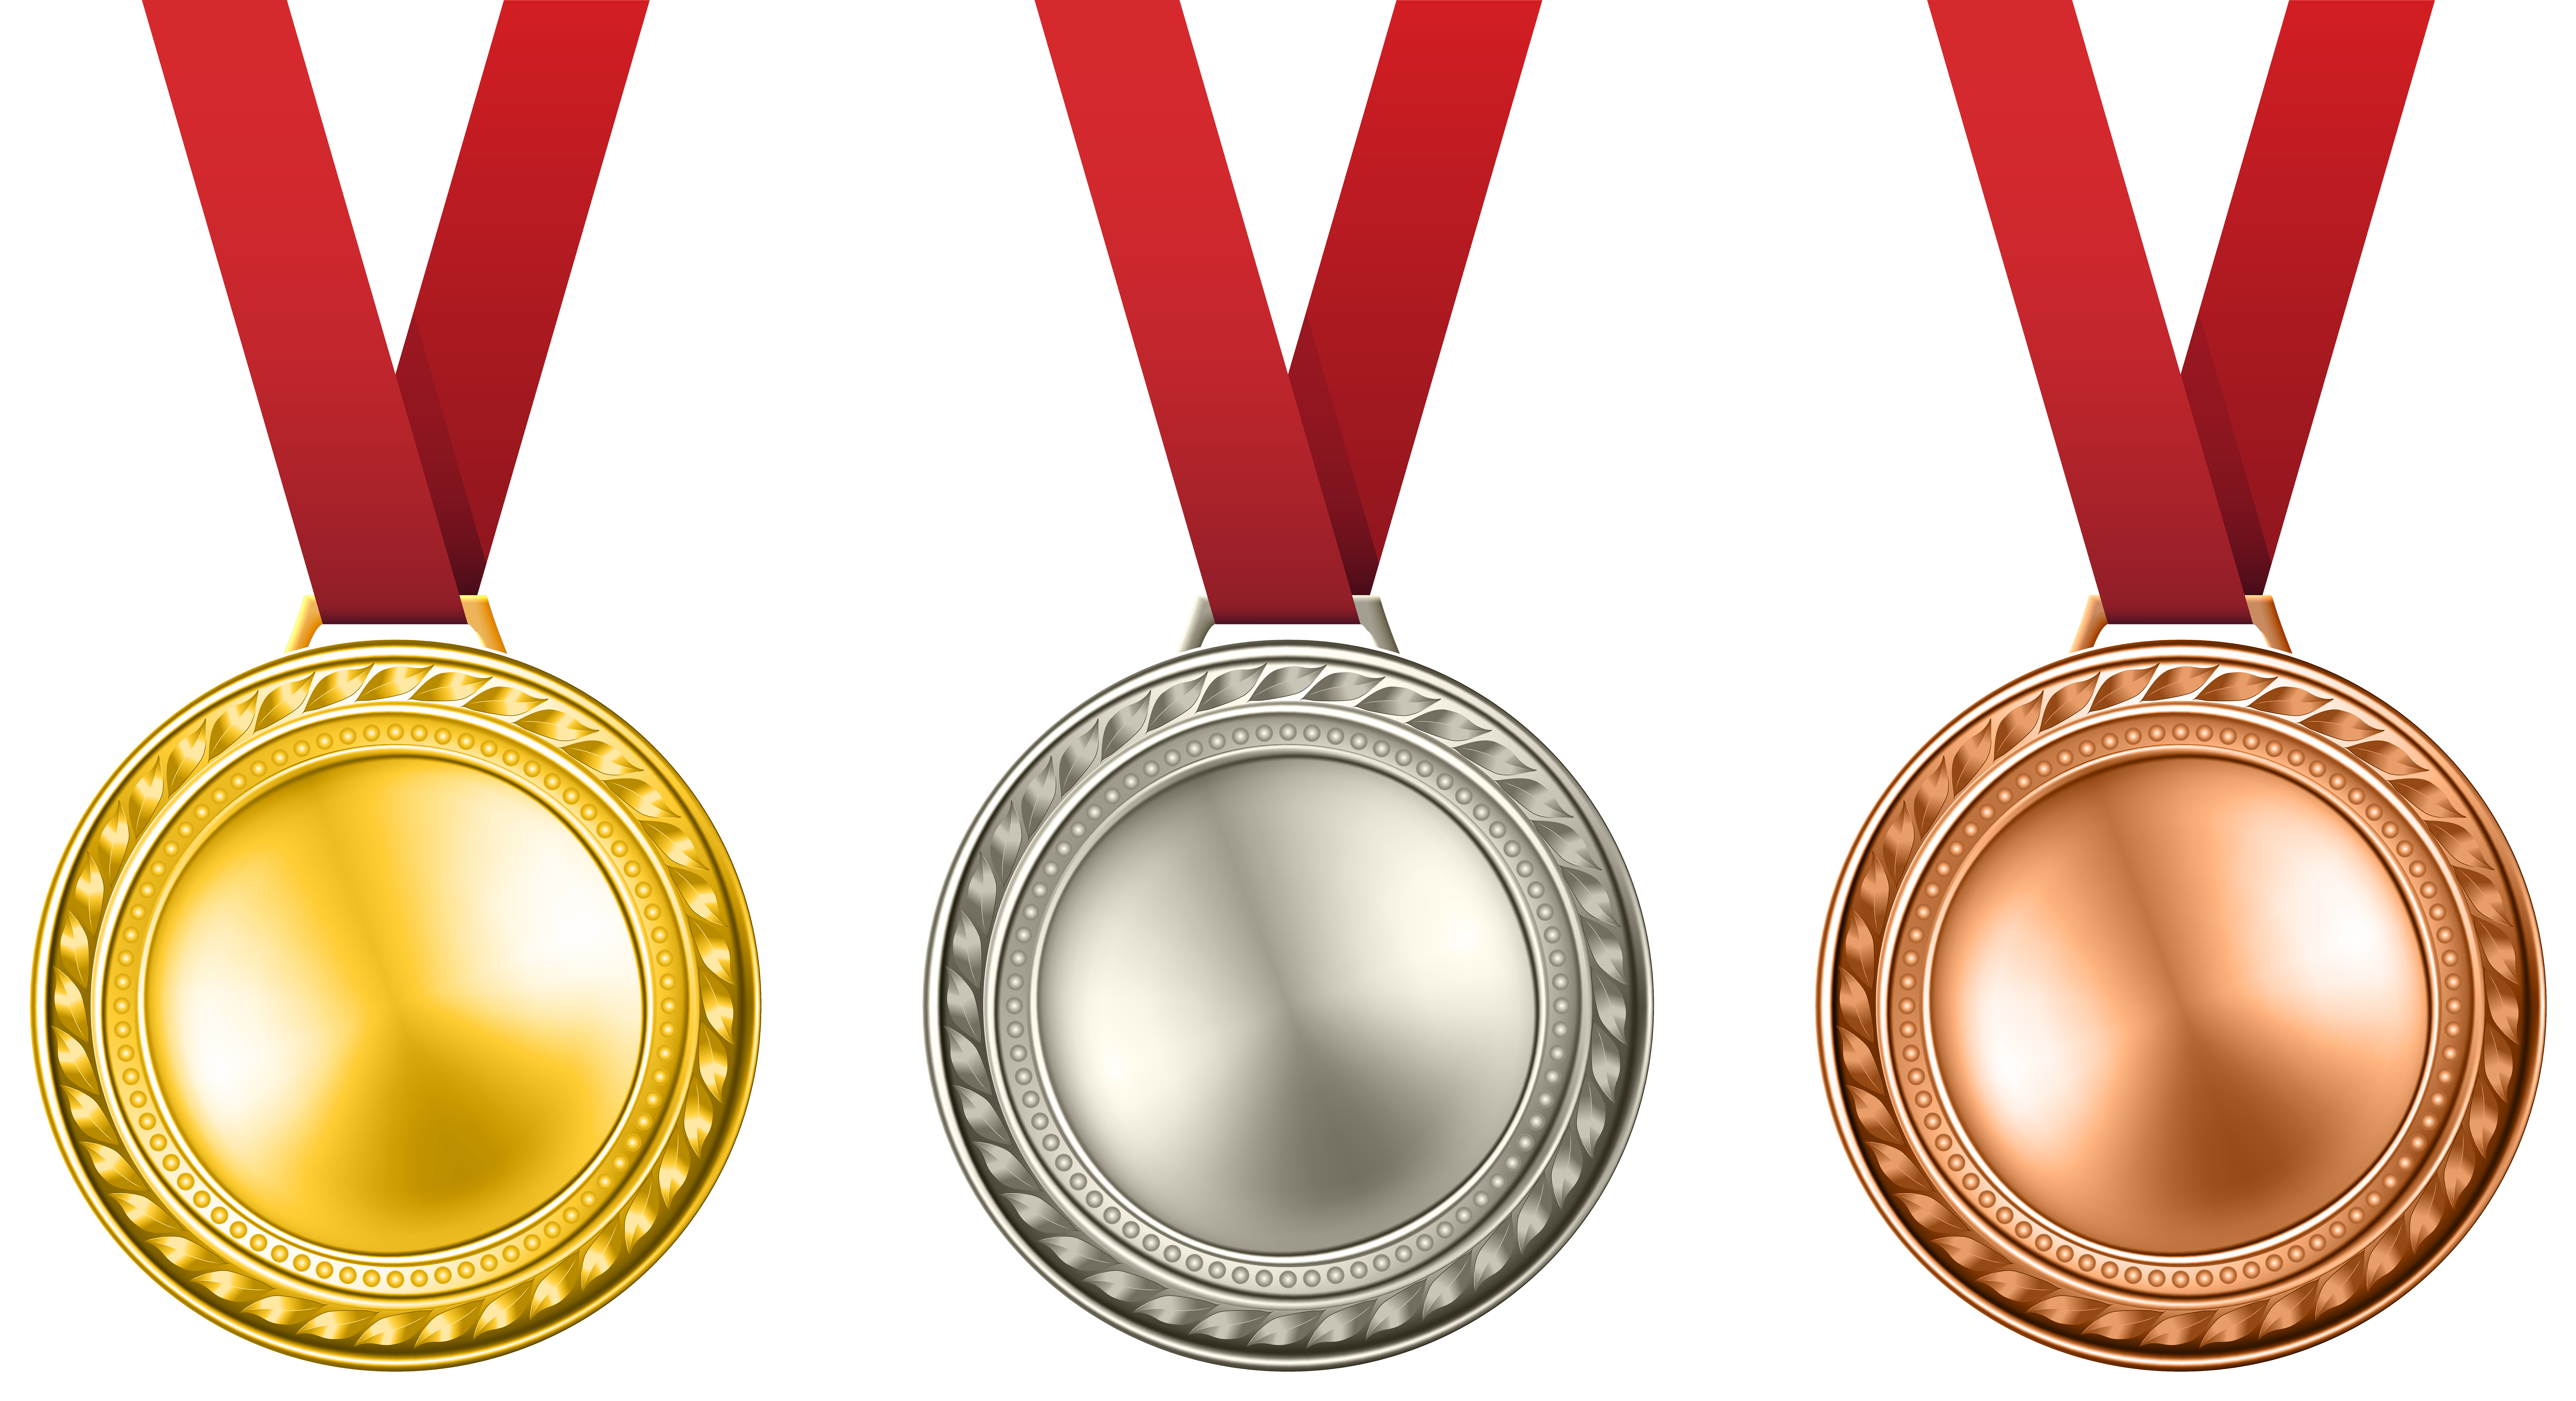 Free medal clipart clip art transparent Medals Set Transparent PNG Clip Art Image | Gallery Yopriceville ... clip art transparent